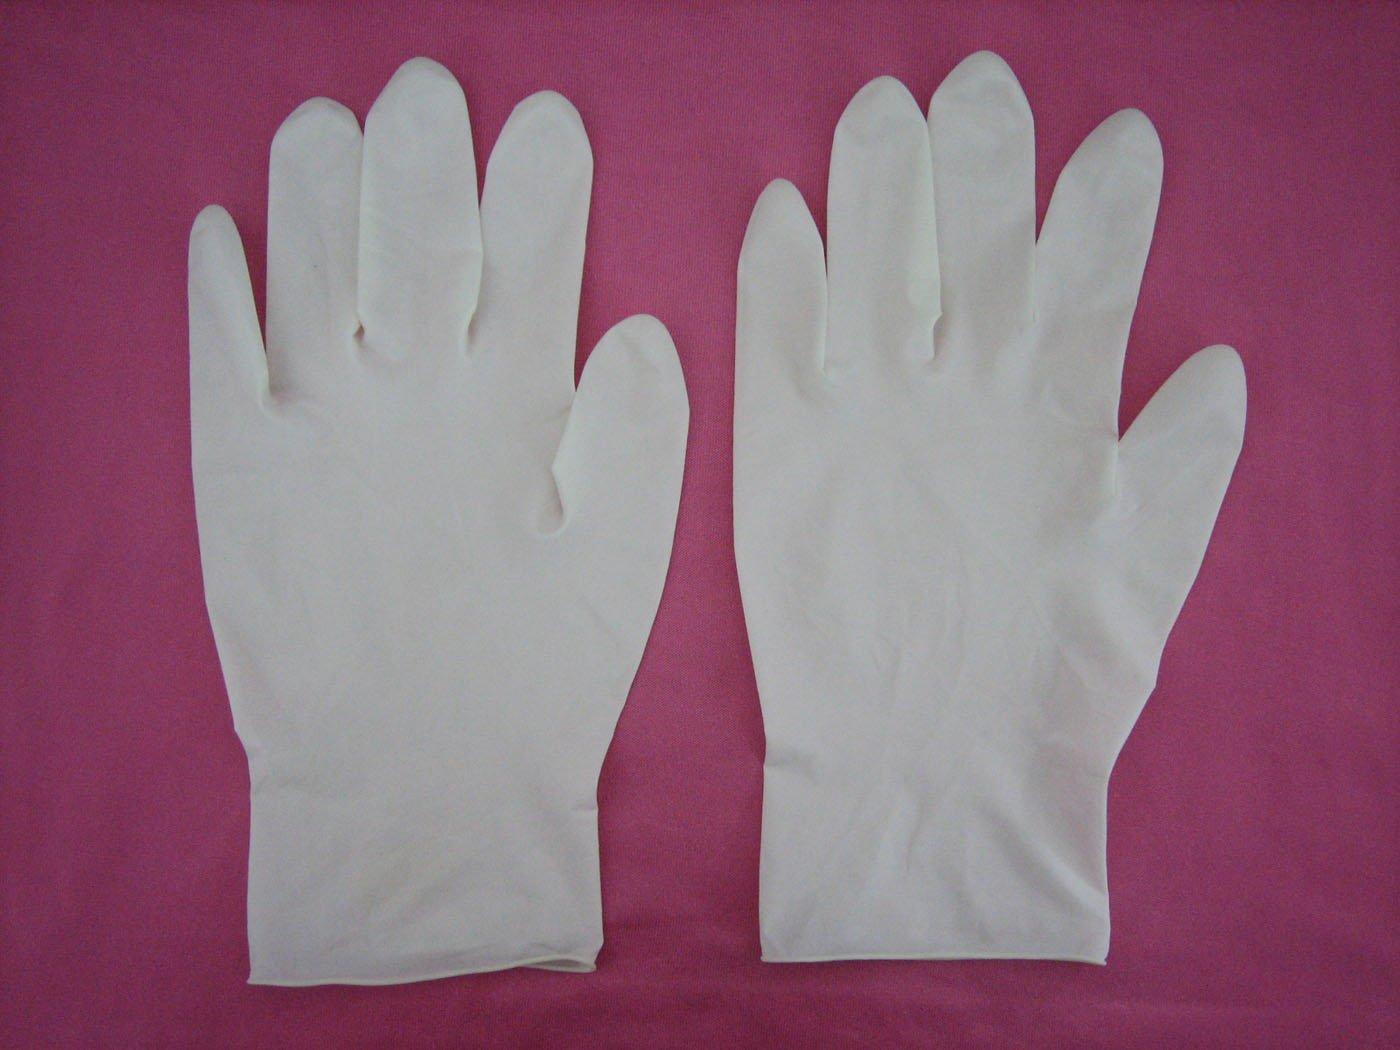 Medical Gloves, Surgical Gloves, Examination Gloves, Safty Gloves, Disposable gloves